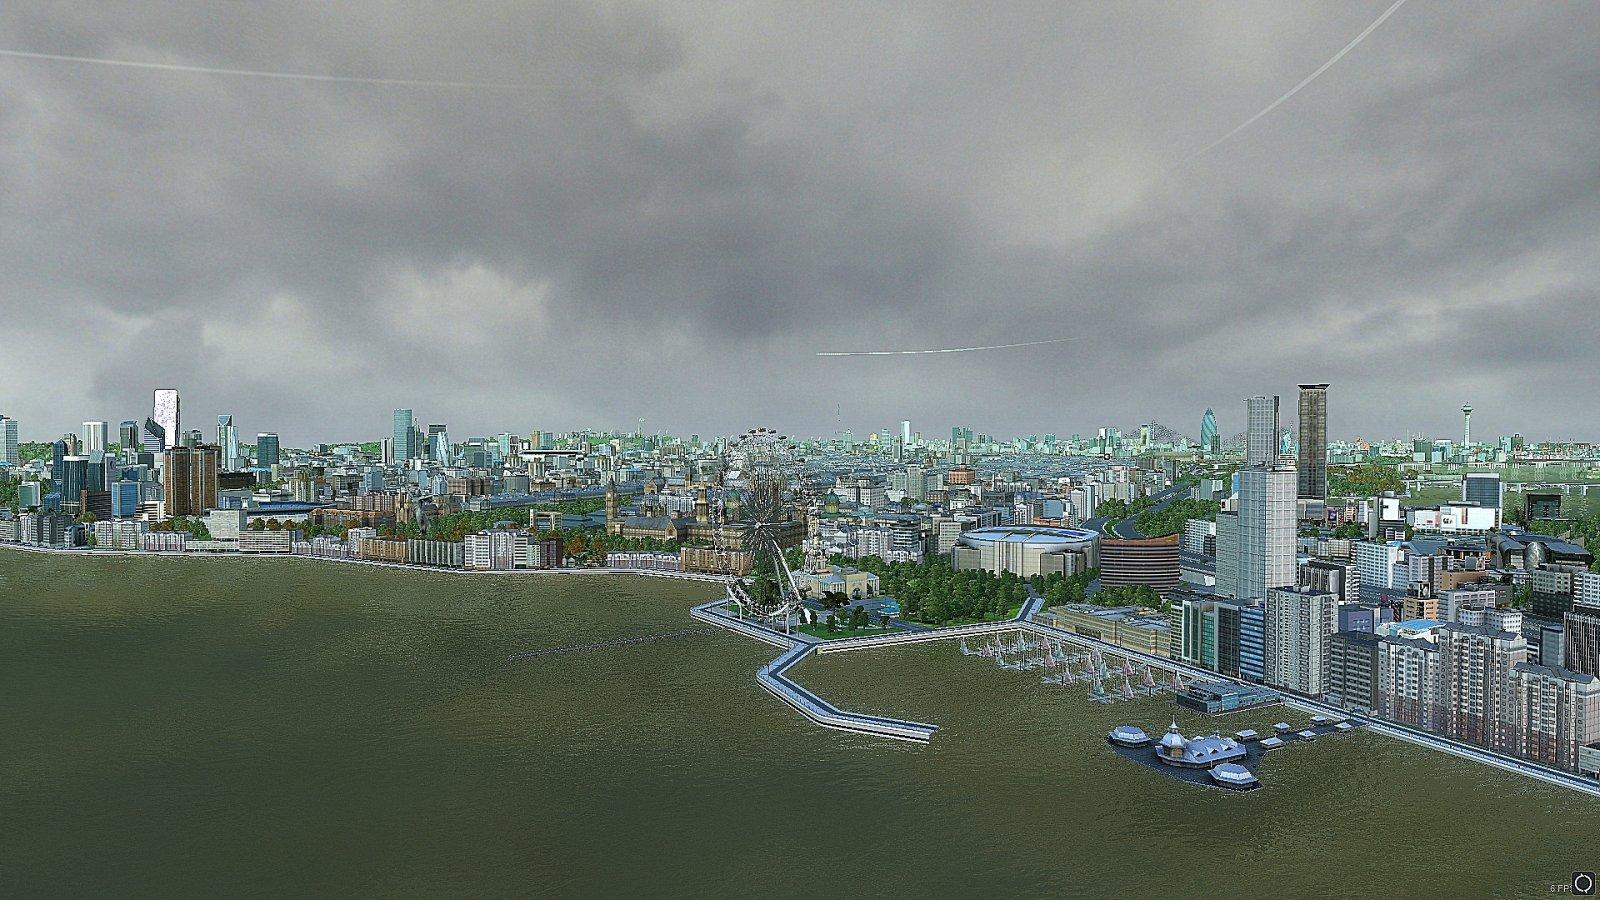 Cities XXL 27_10_2017 20_14_04.jpg